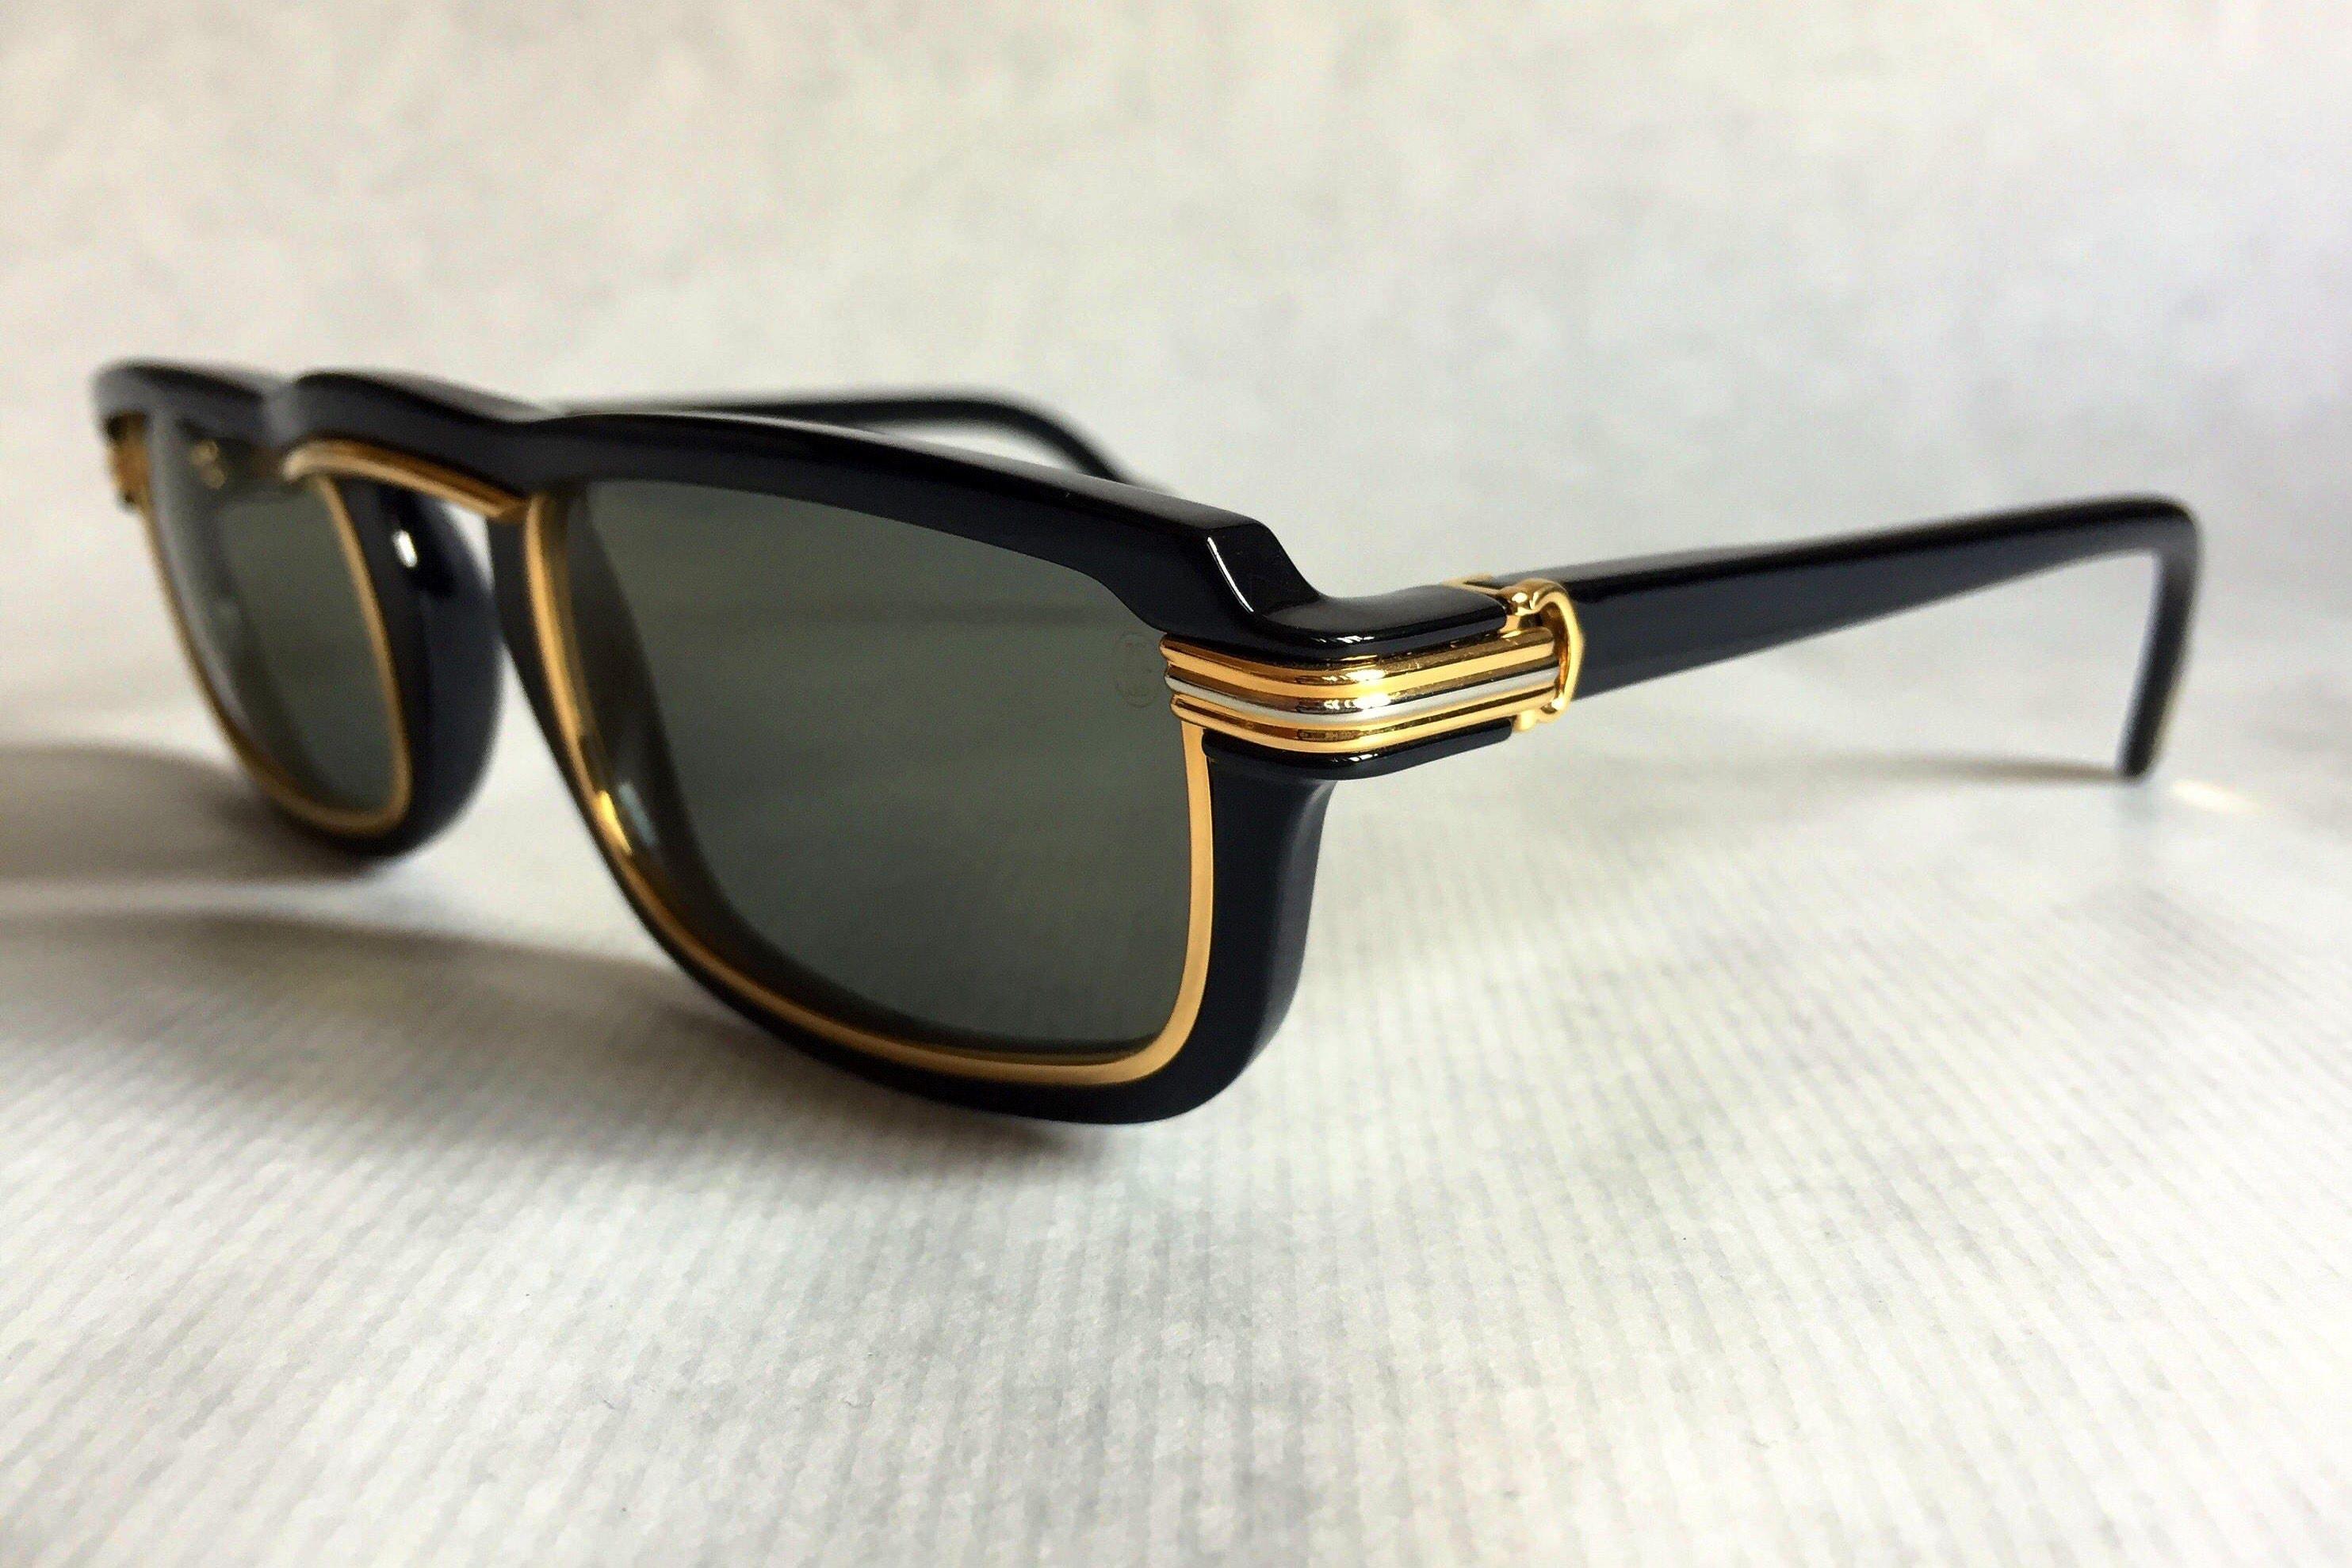 761a5baab48f Cartier Vertigo Vintage Sunglasses - Full Set - New Old Stock. gallery  photo gallery photo gallery photo gallery photo gallery photo